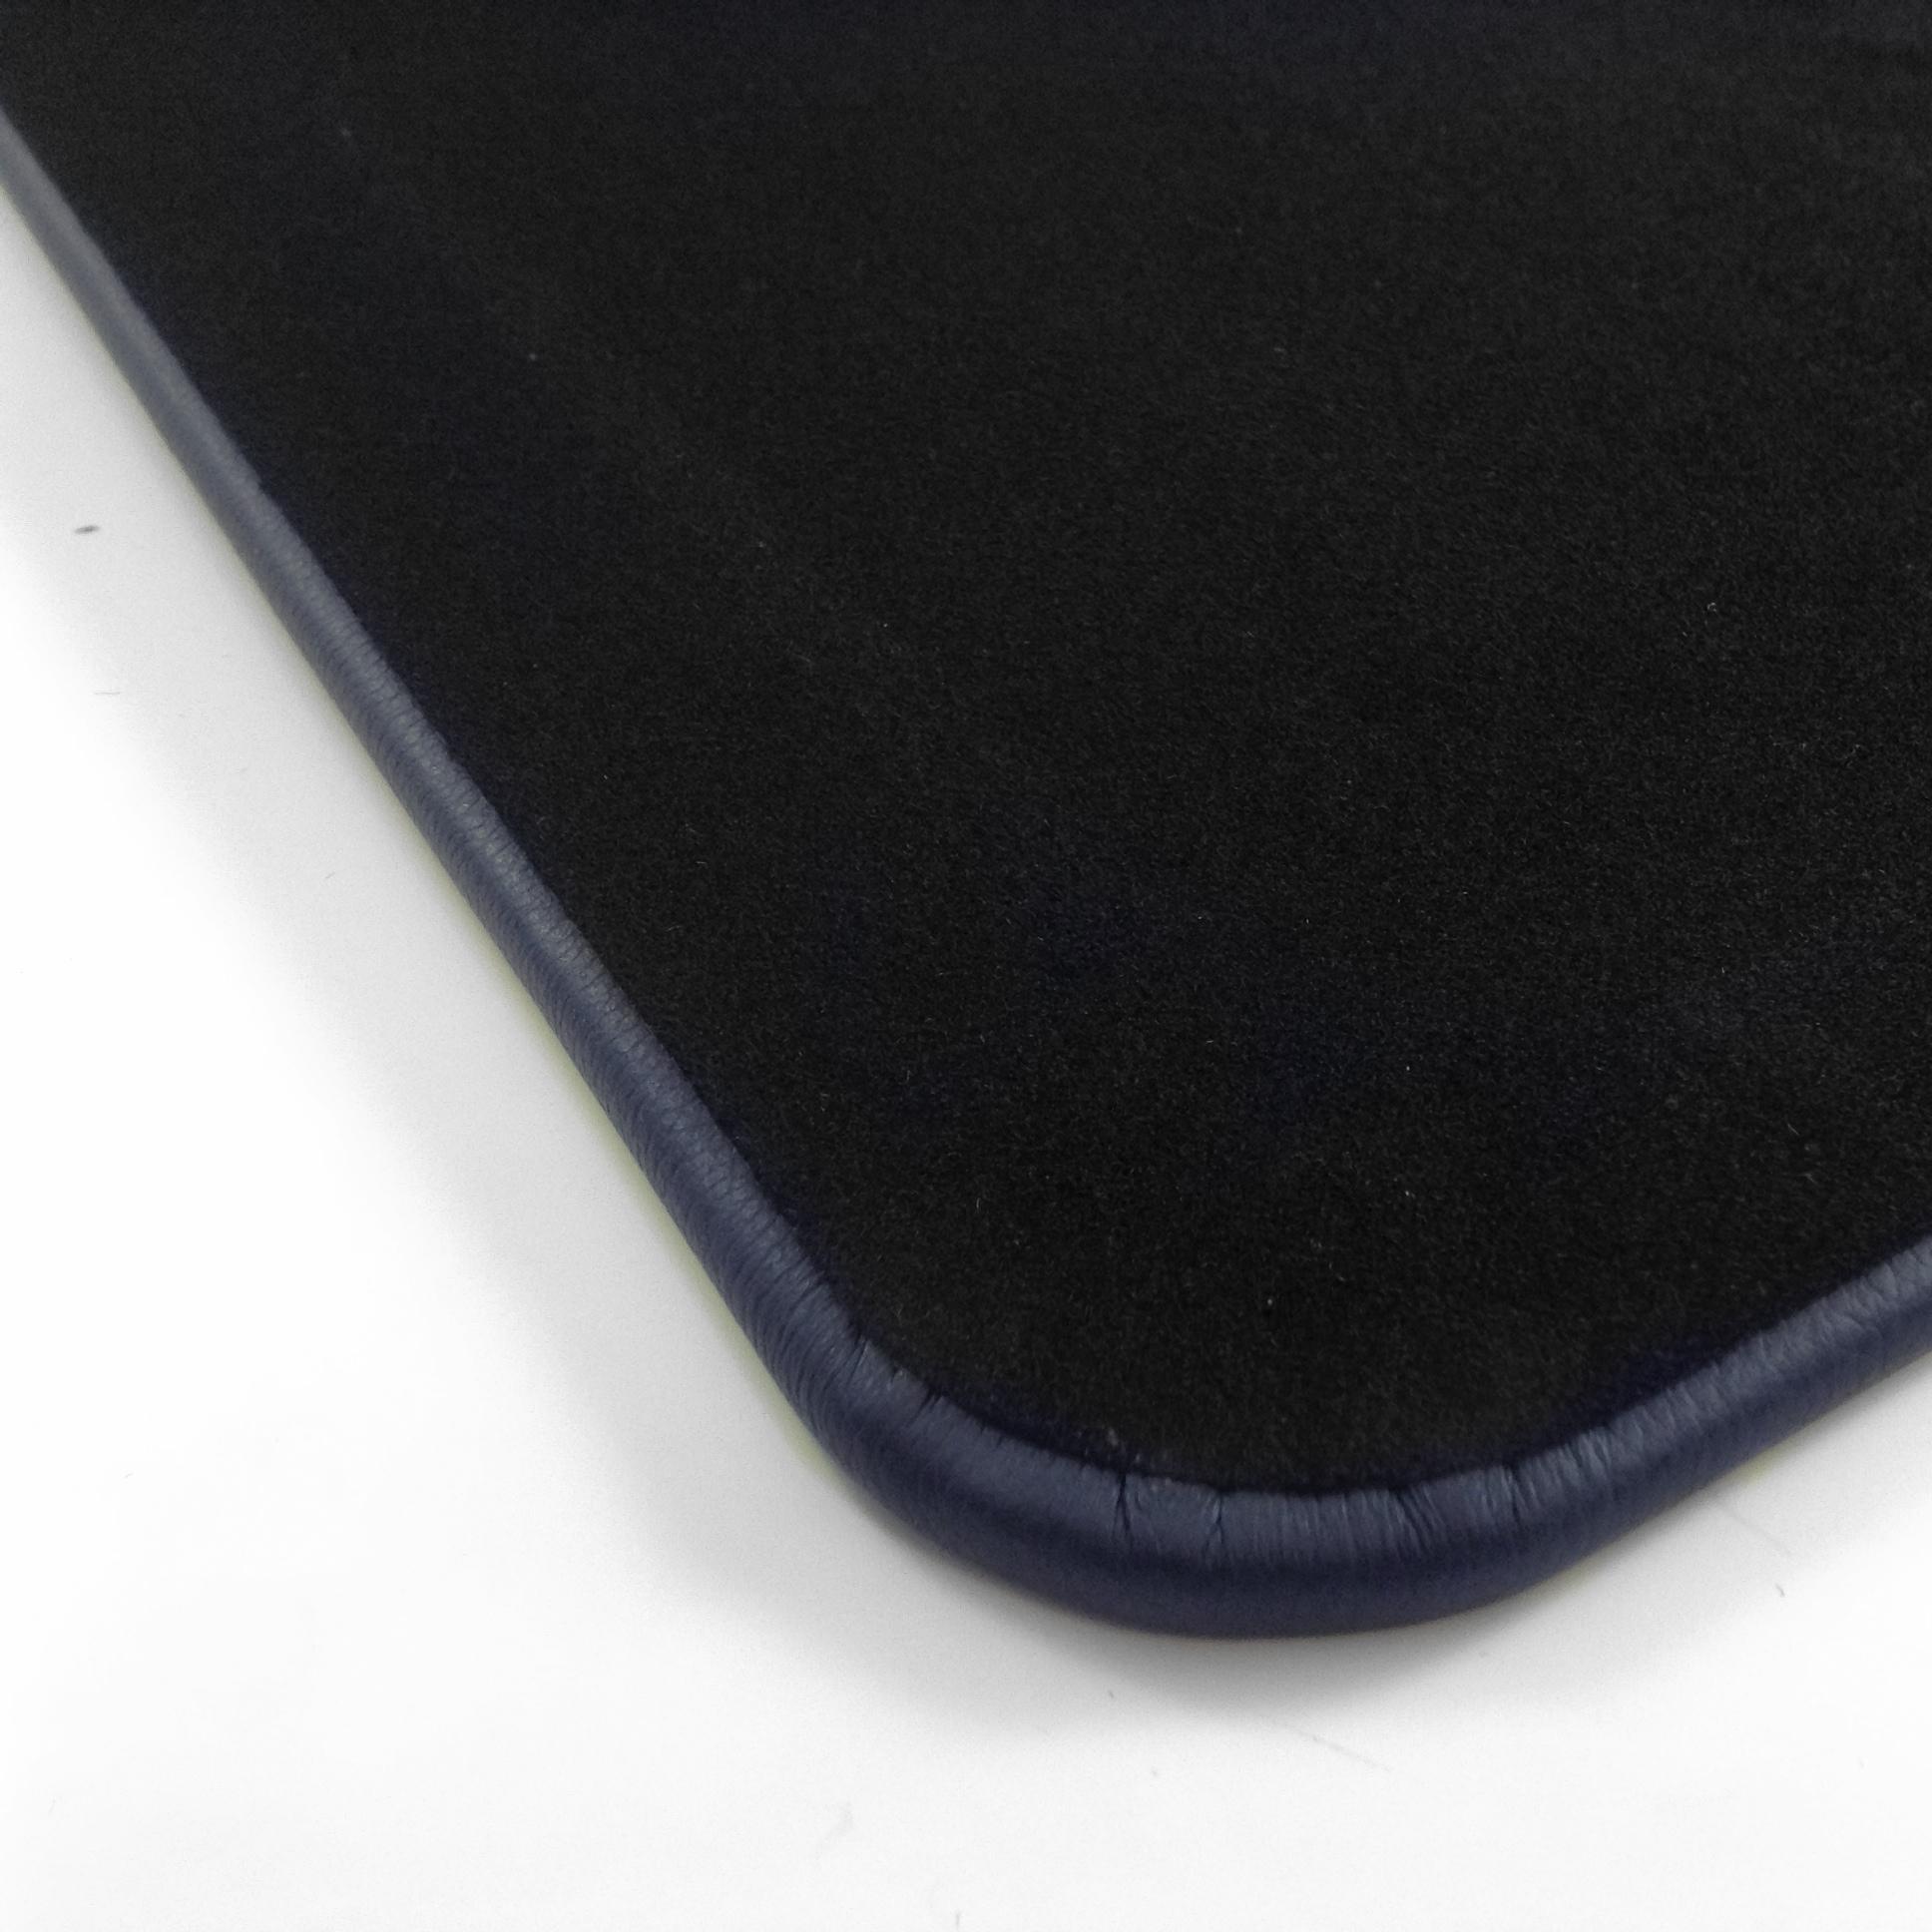 Blue Leather Desk Blotter Pad